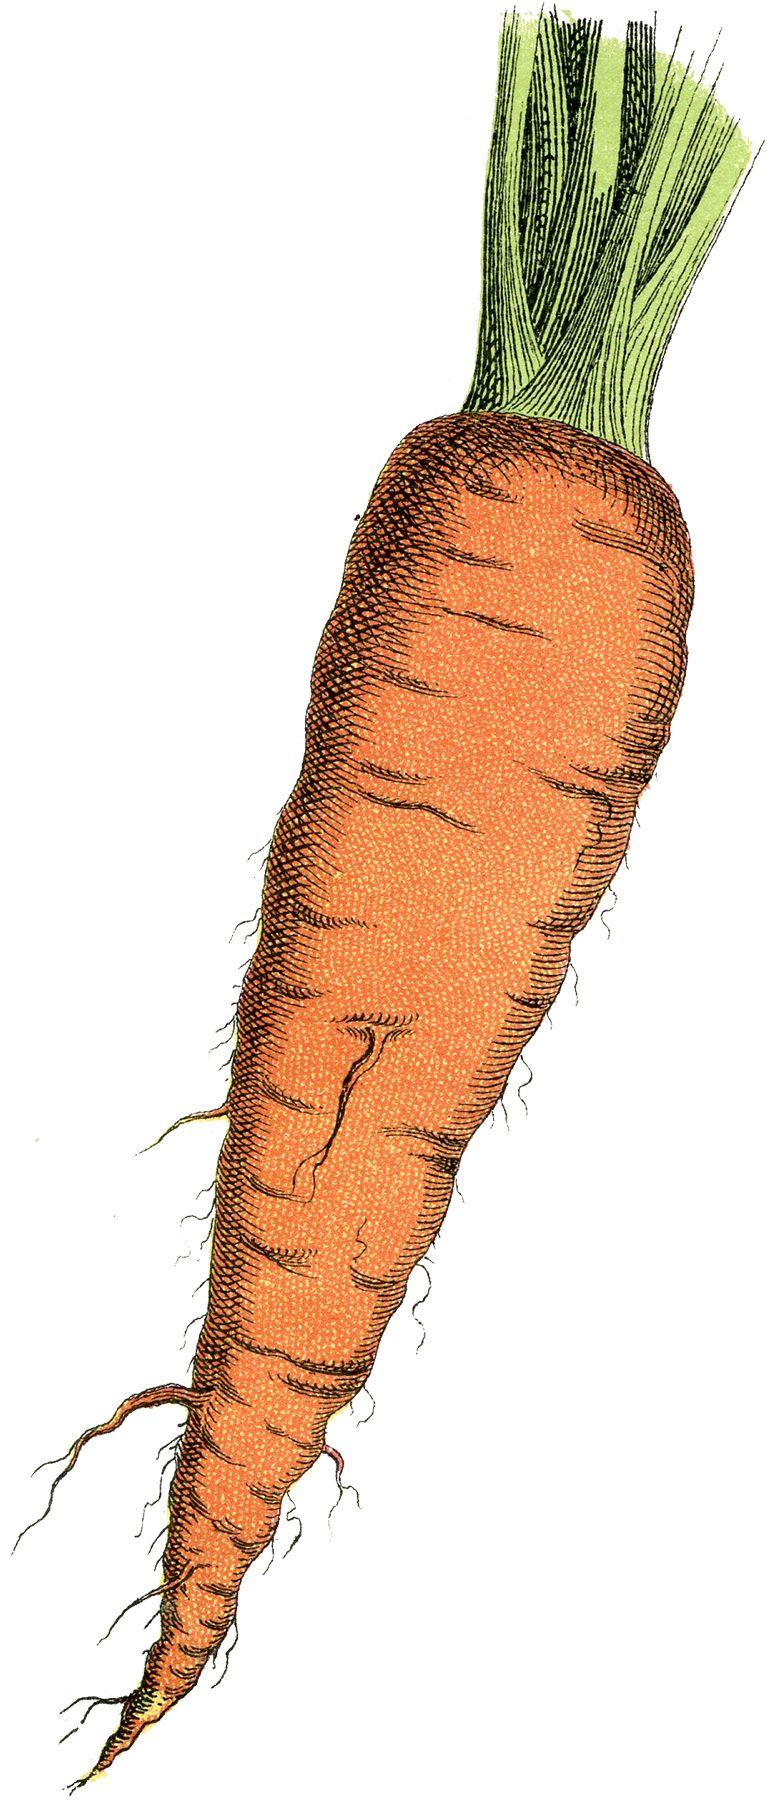 Carrot clipart spring. Free image carrots ephemera